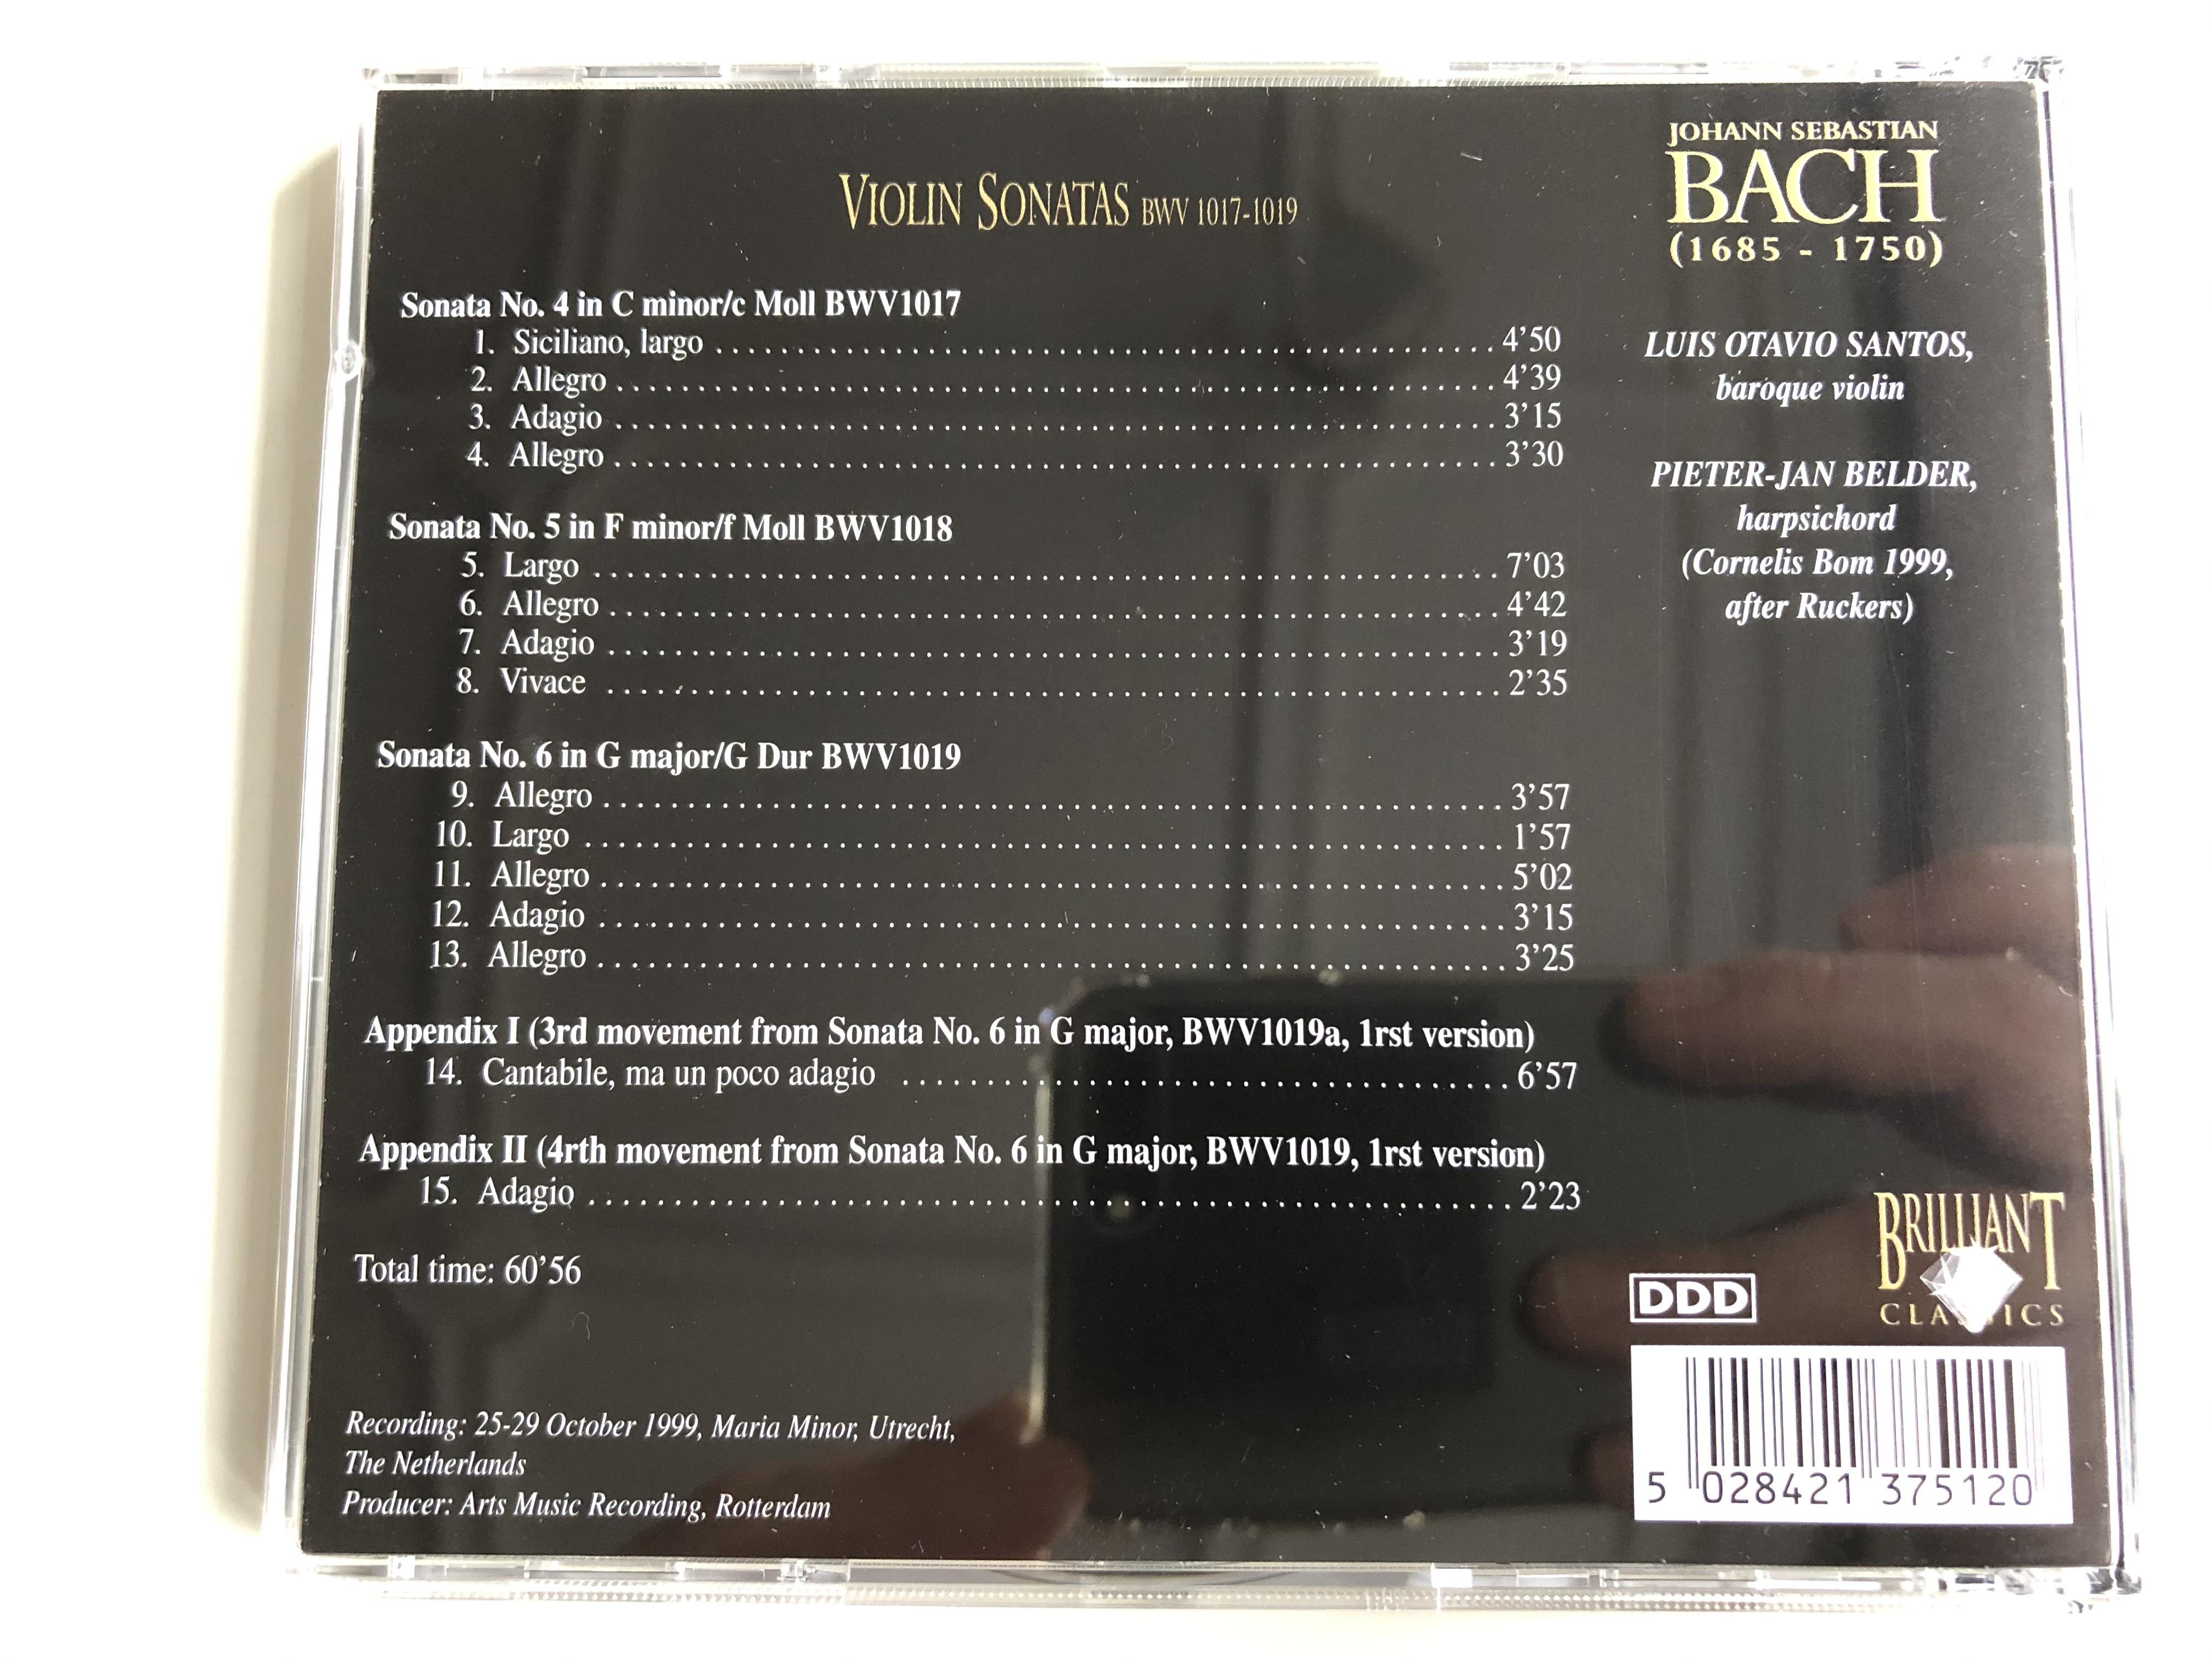 bach-edition-violin-sonatas-bwv-1017-1019-violinsonaten-brilliant-classics-audio-cd-9937512-4-.jpg